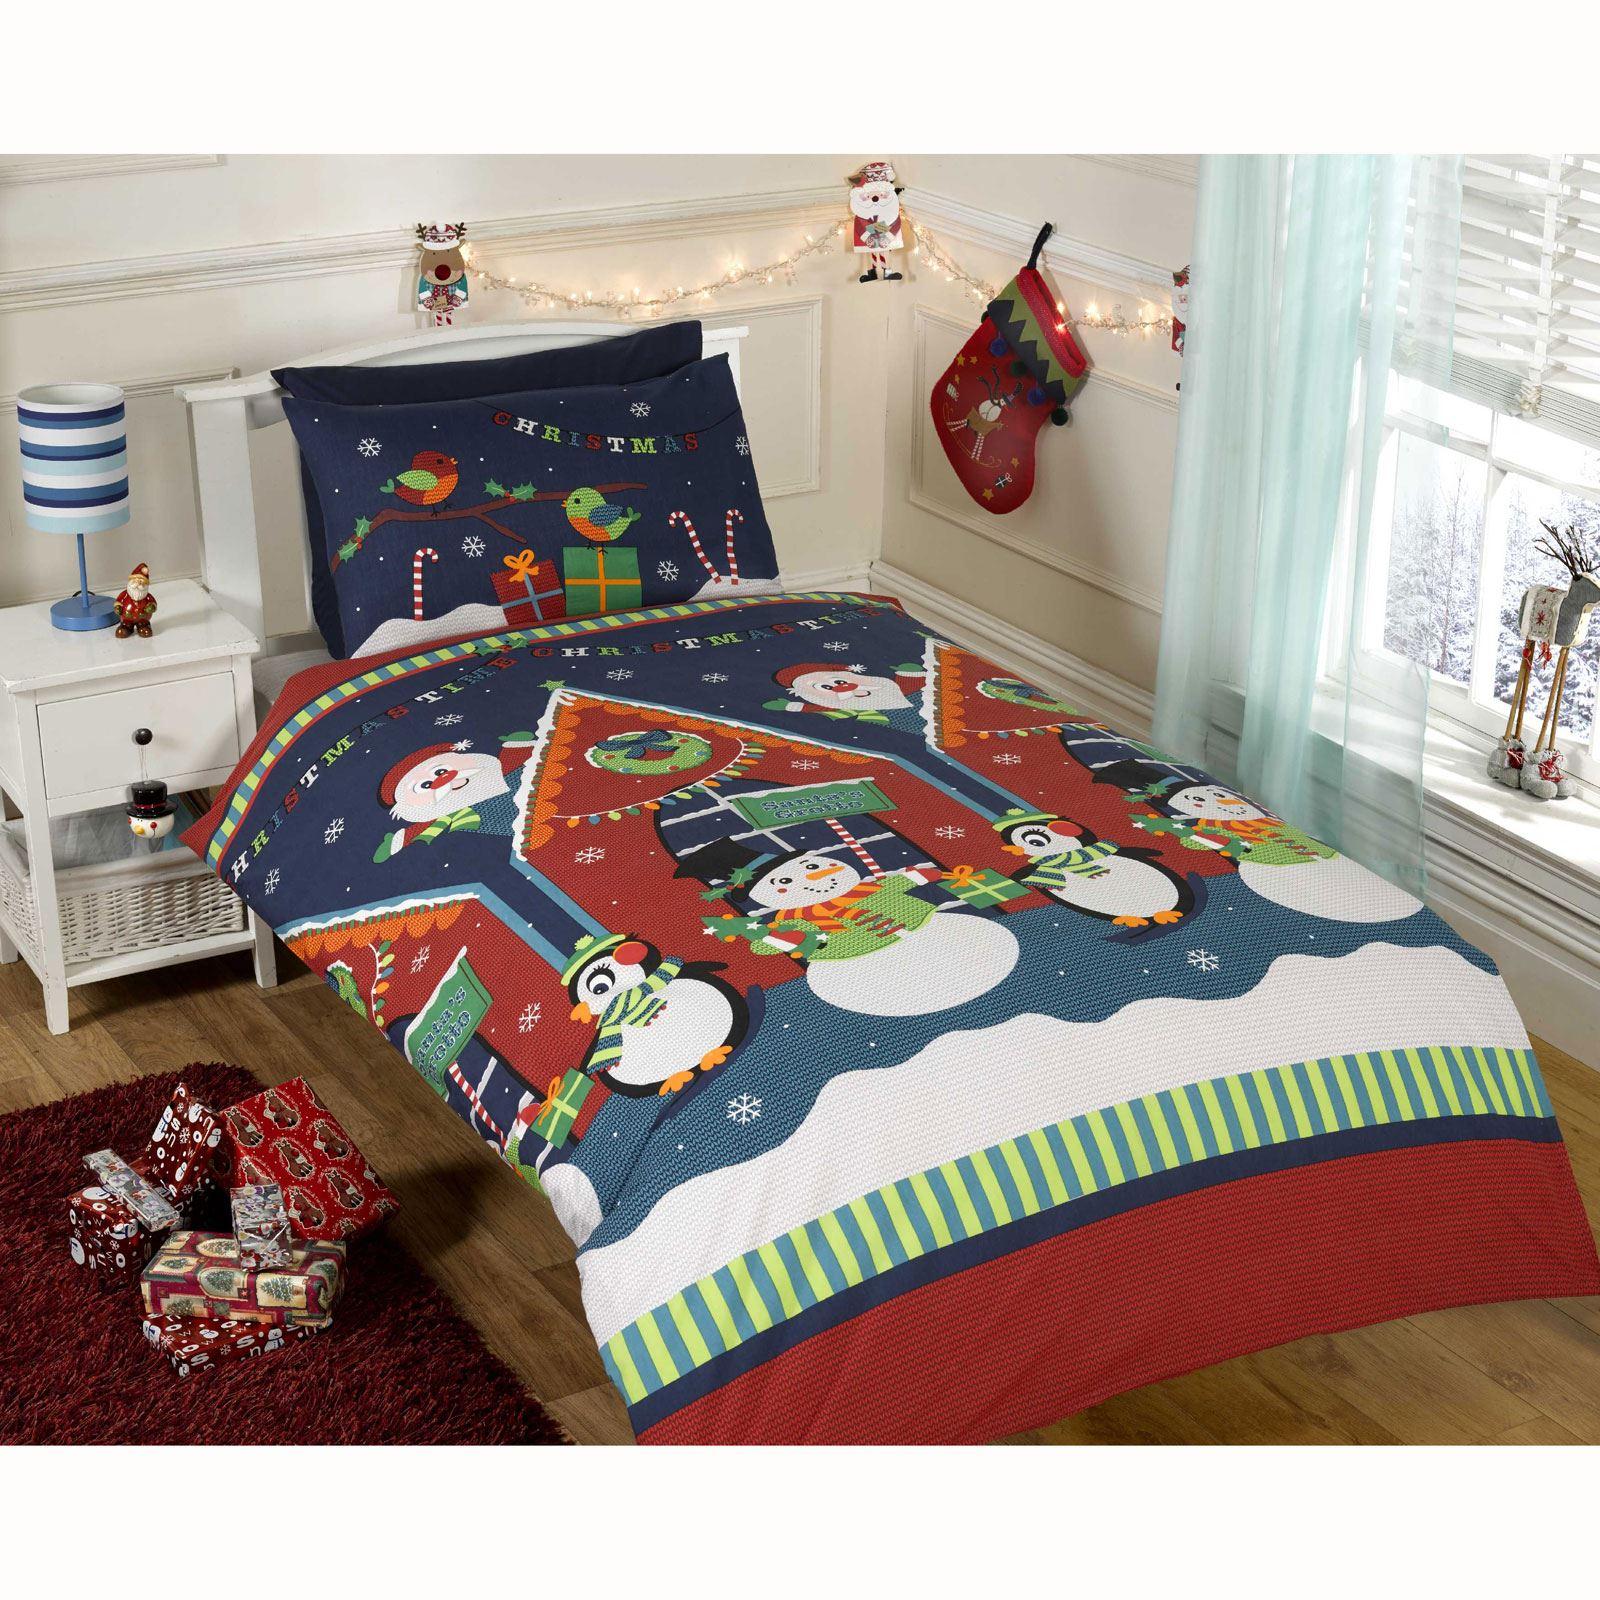 christmas duvet cover bedding sets – twin double & junior – santa